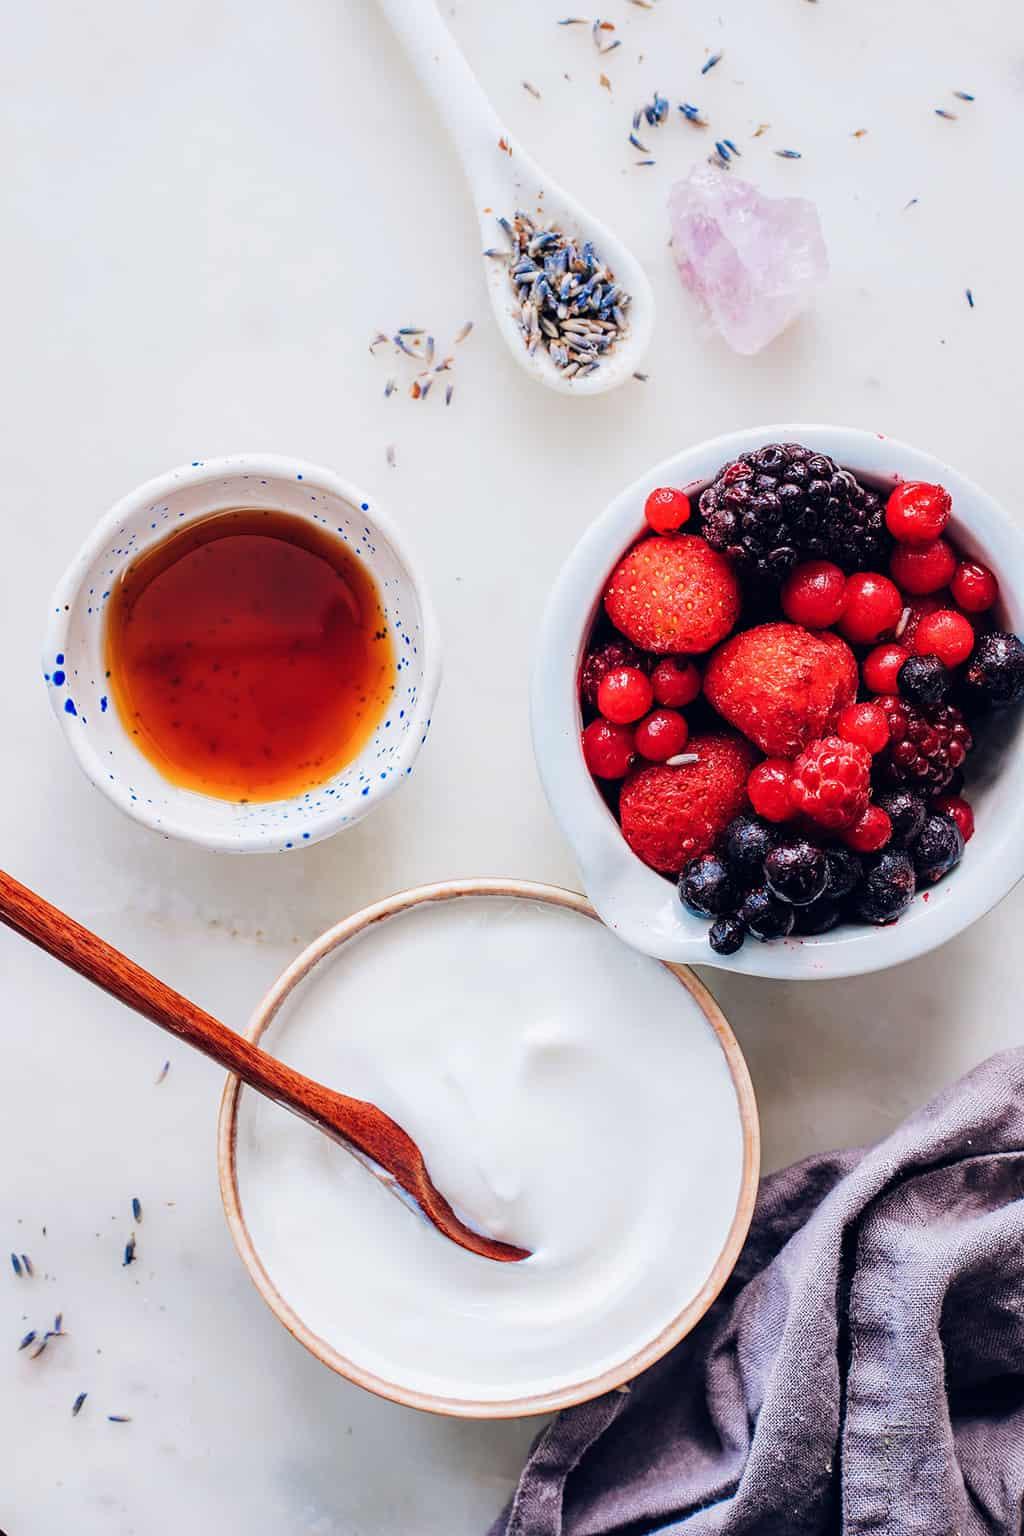 Ingredients for Coconut Yogurt Smoothie Recipe